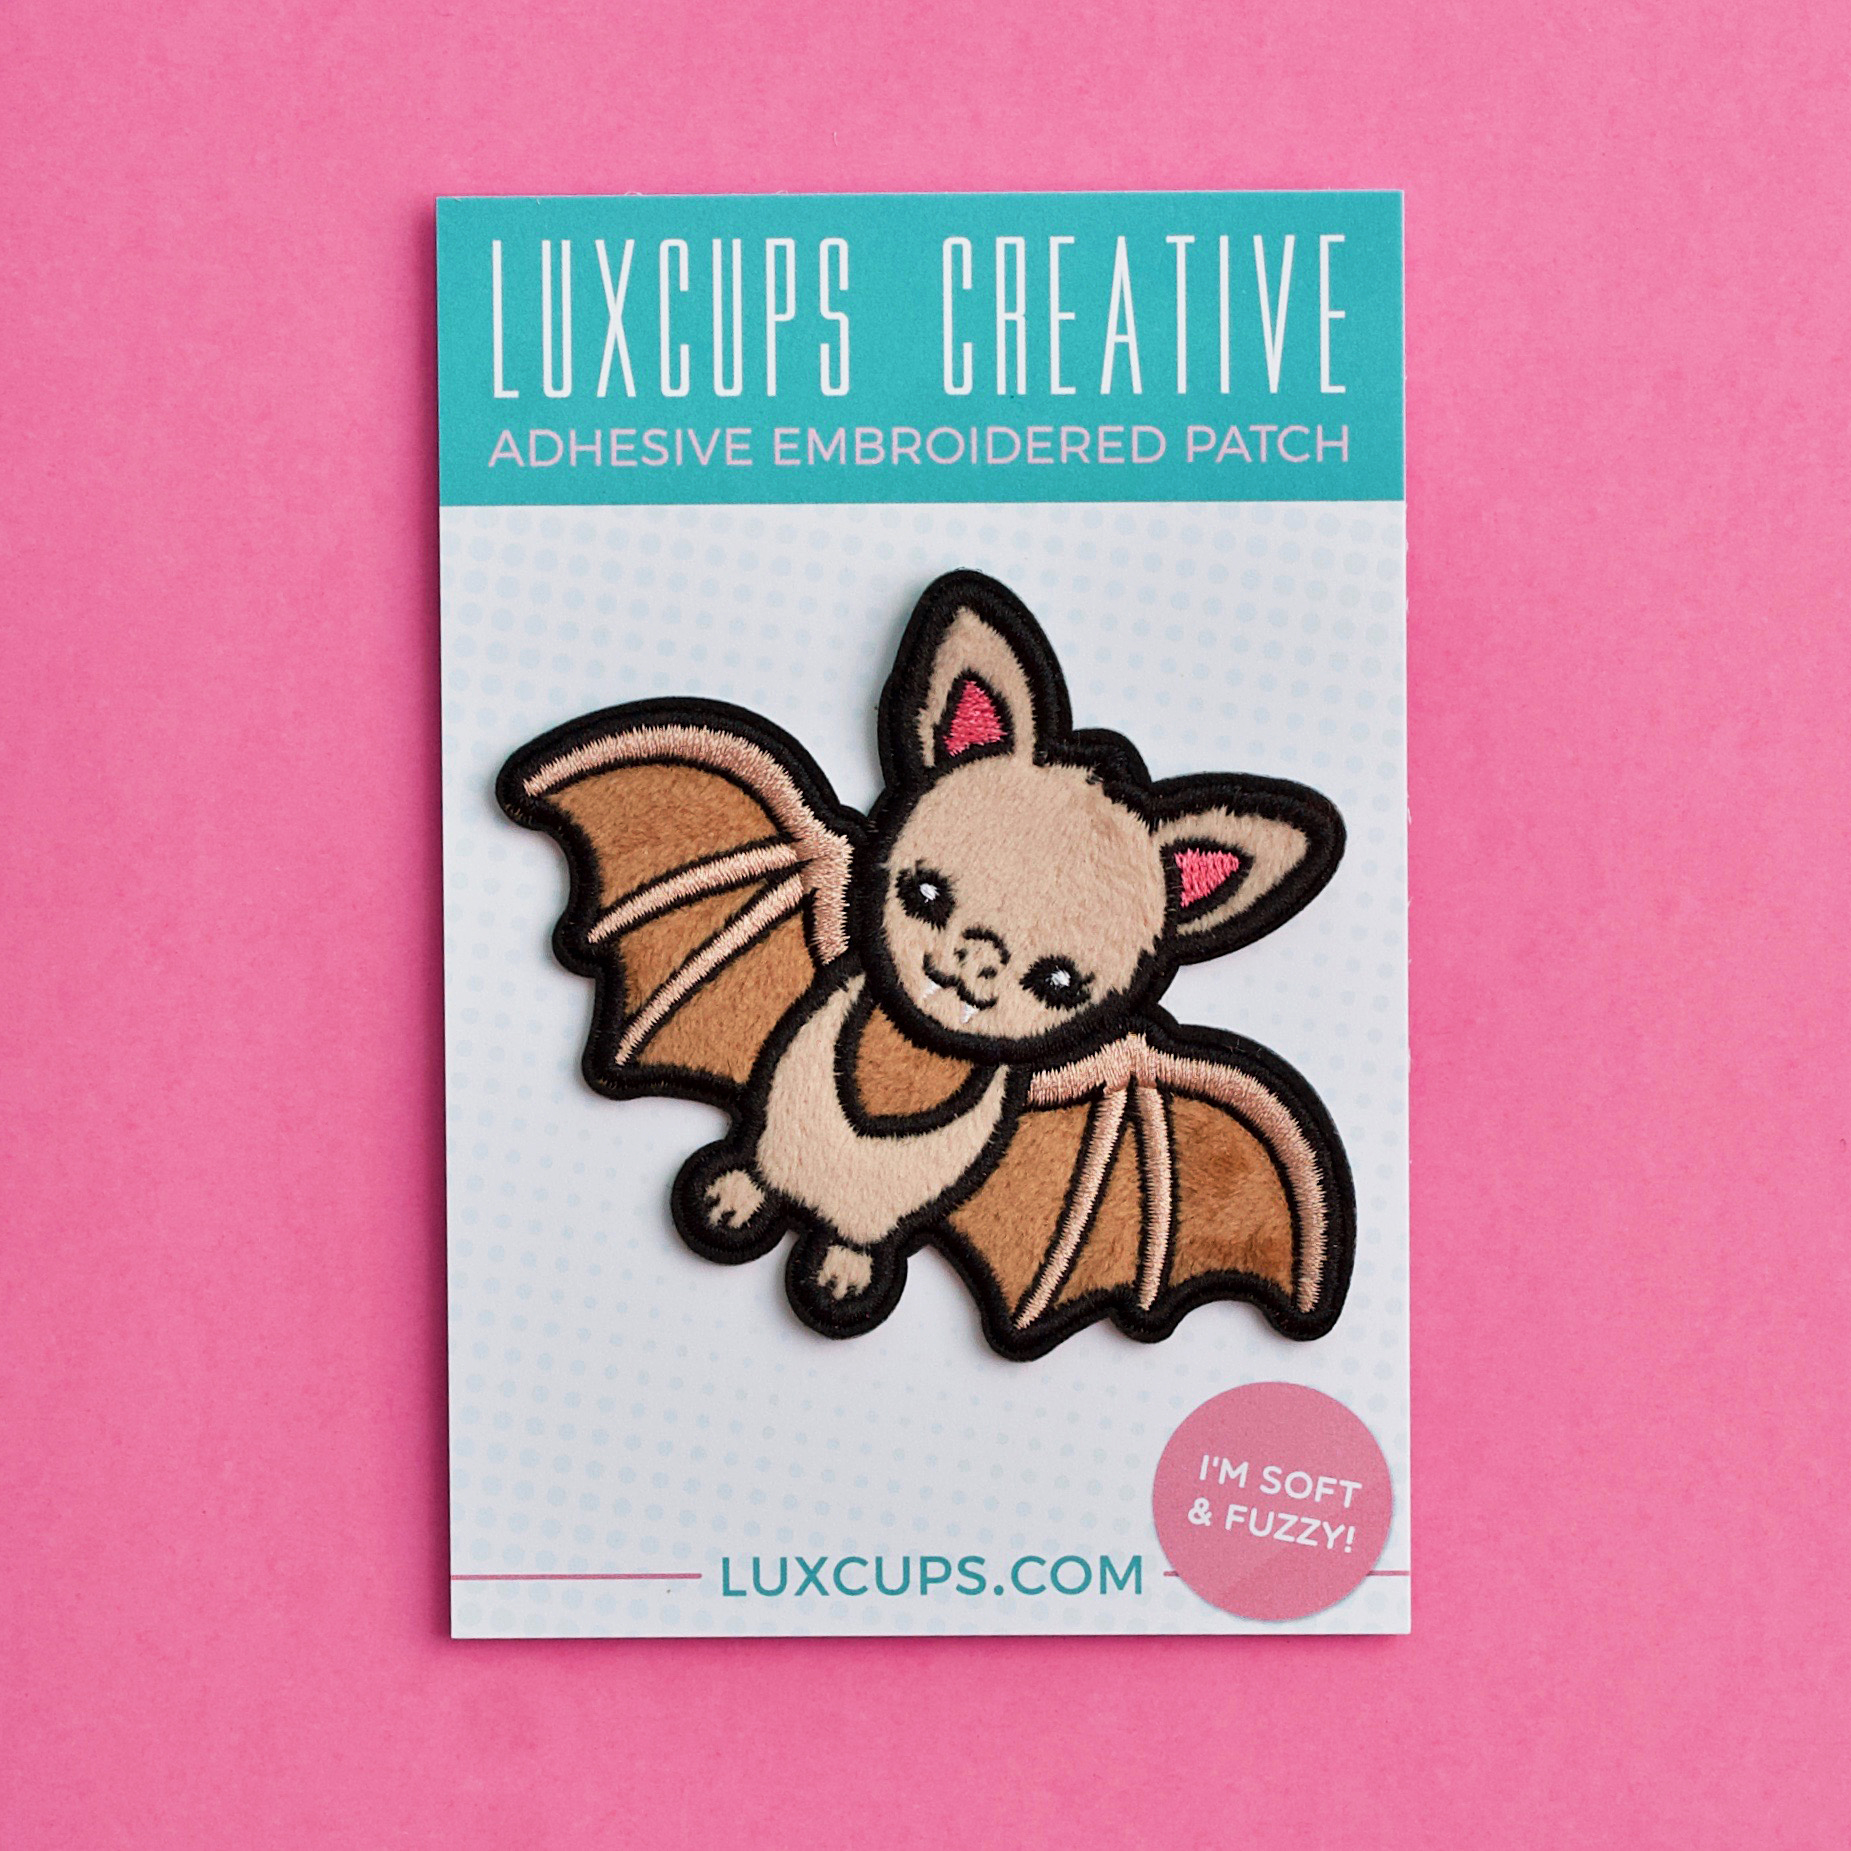 BROWN BAT ENAMEL PIN BY LUXCUPS CREATIVE